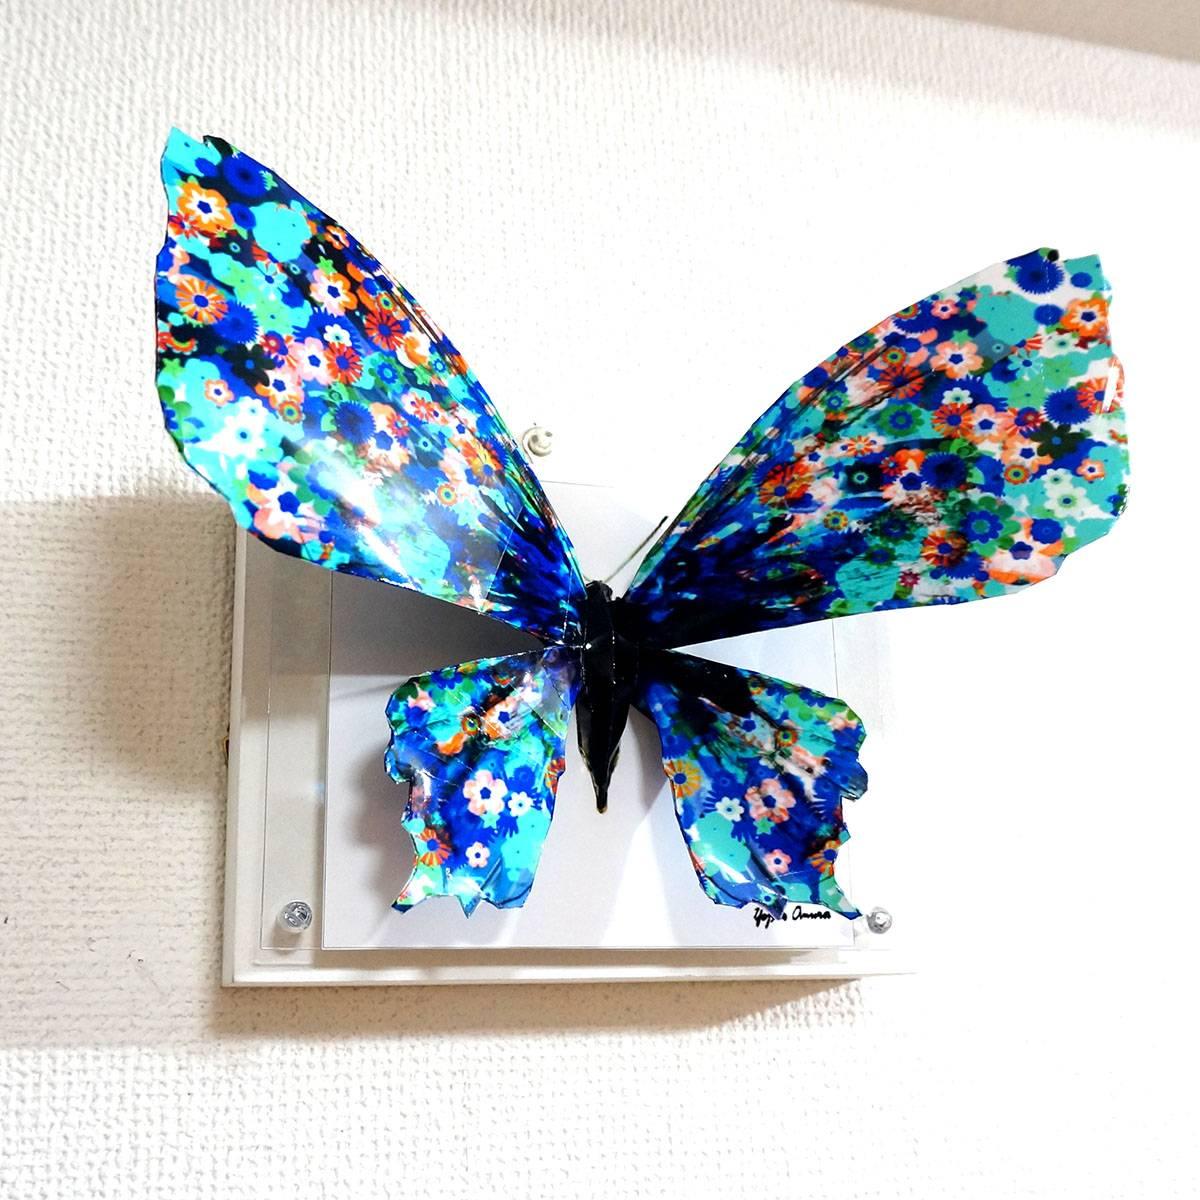 The blue flower butterfly spreads its wings ED:4/10